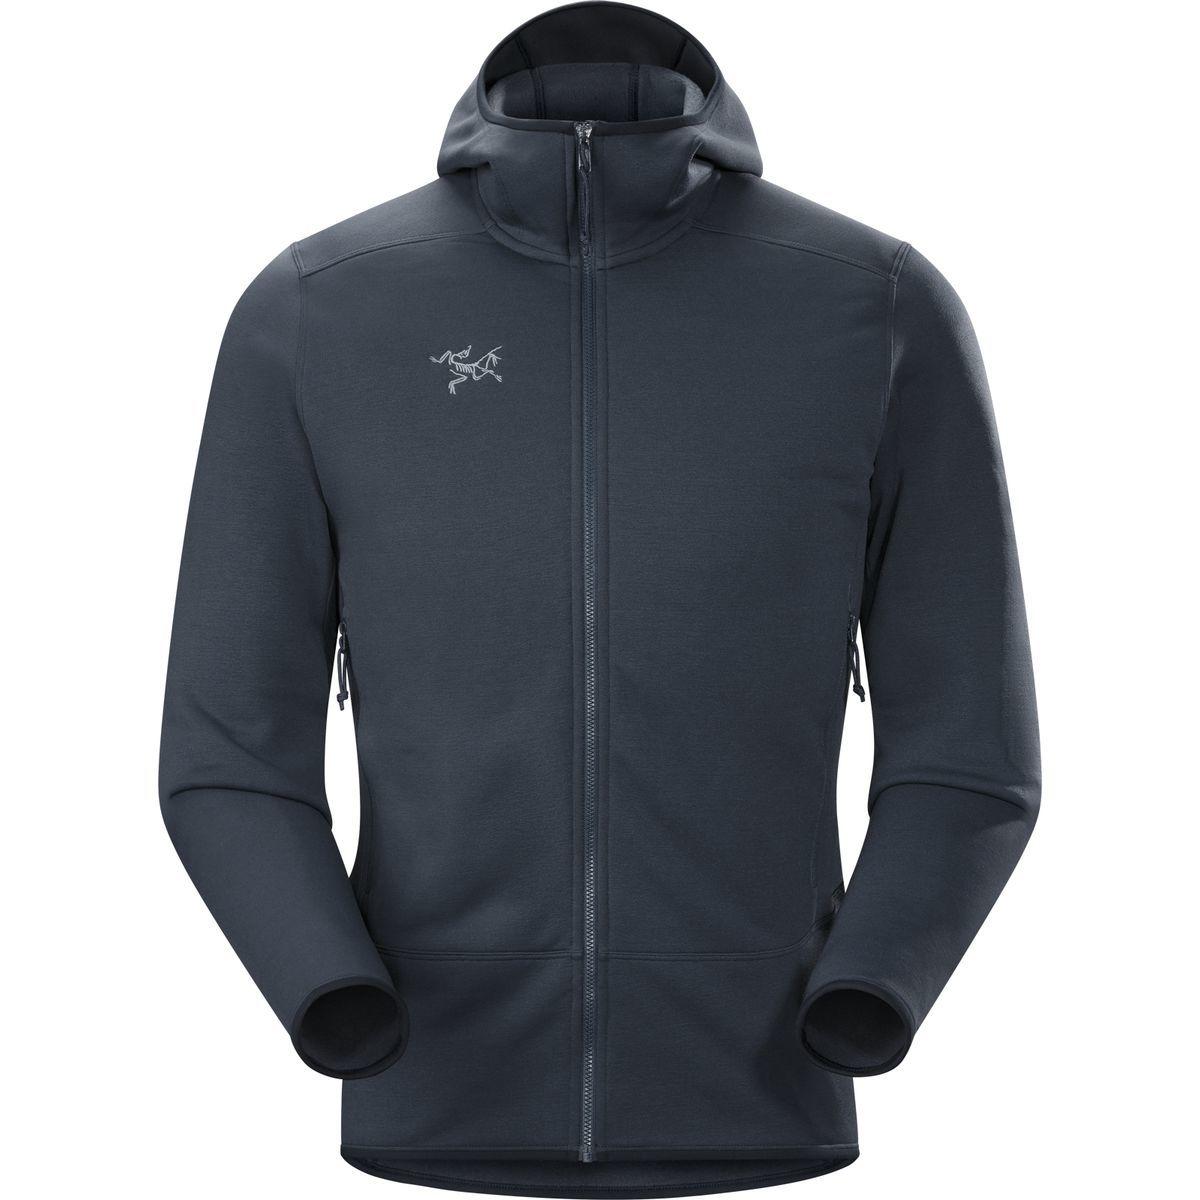 Arc'teryx Kyanite Hooded Fleece Jacket - Men's